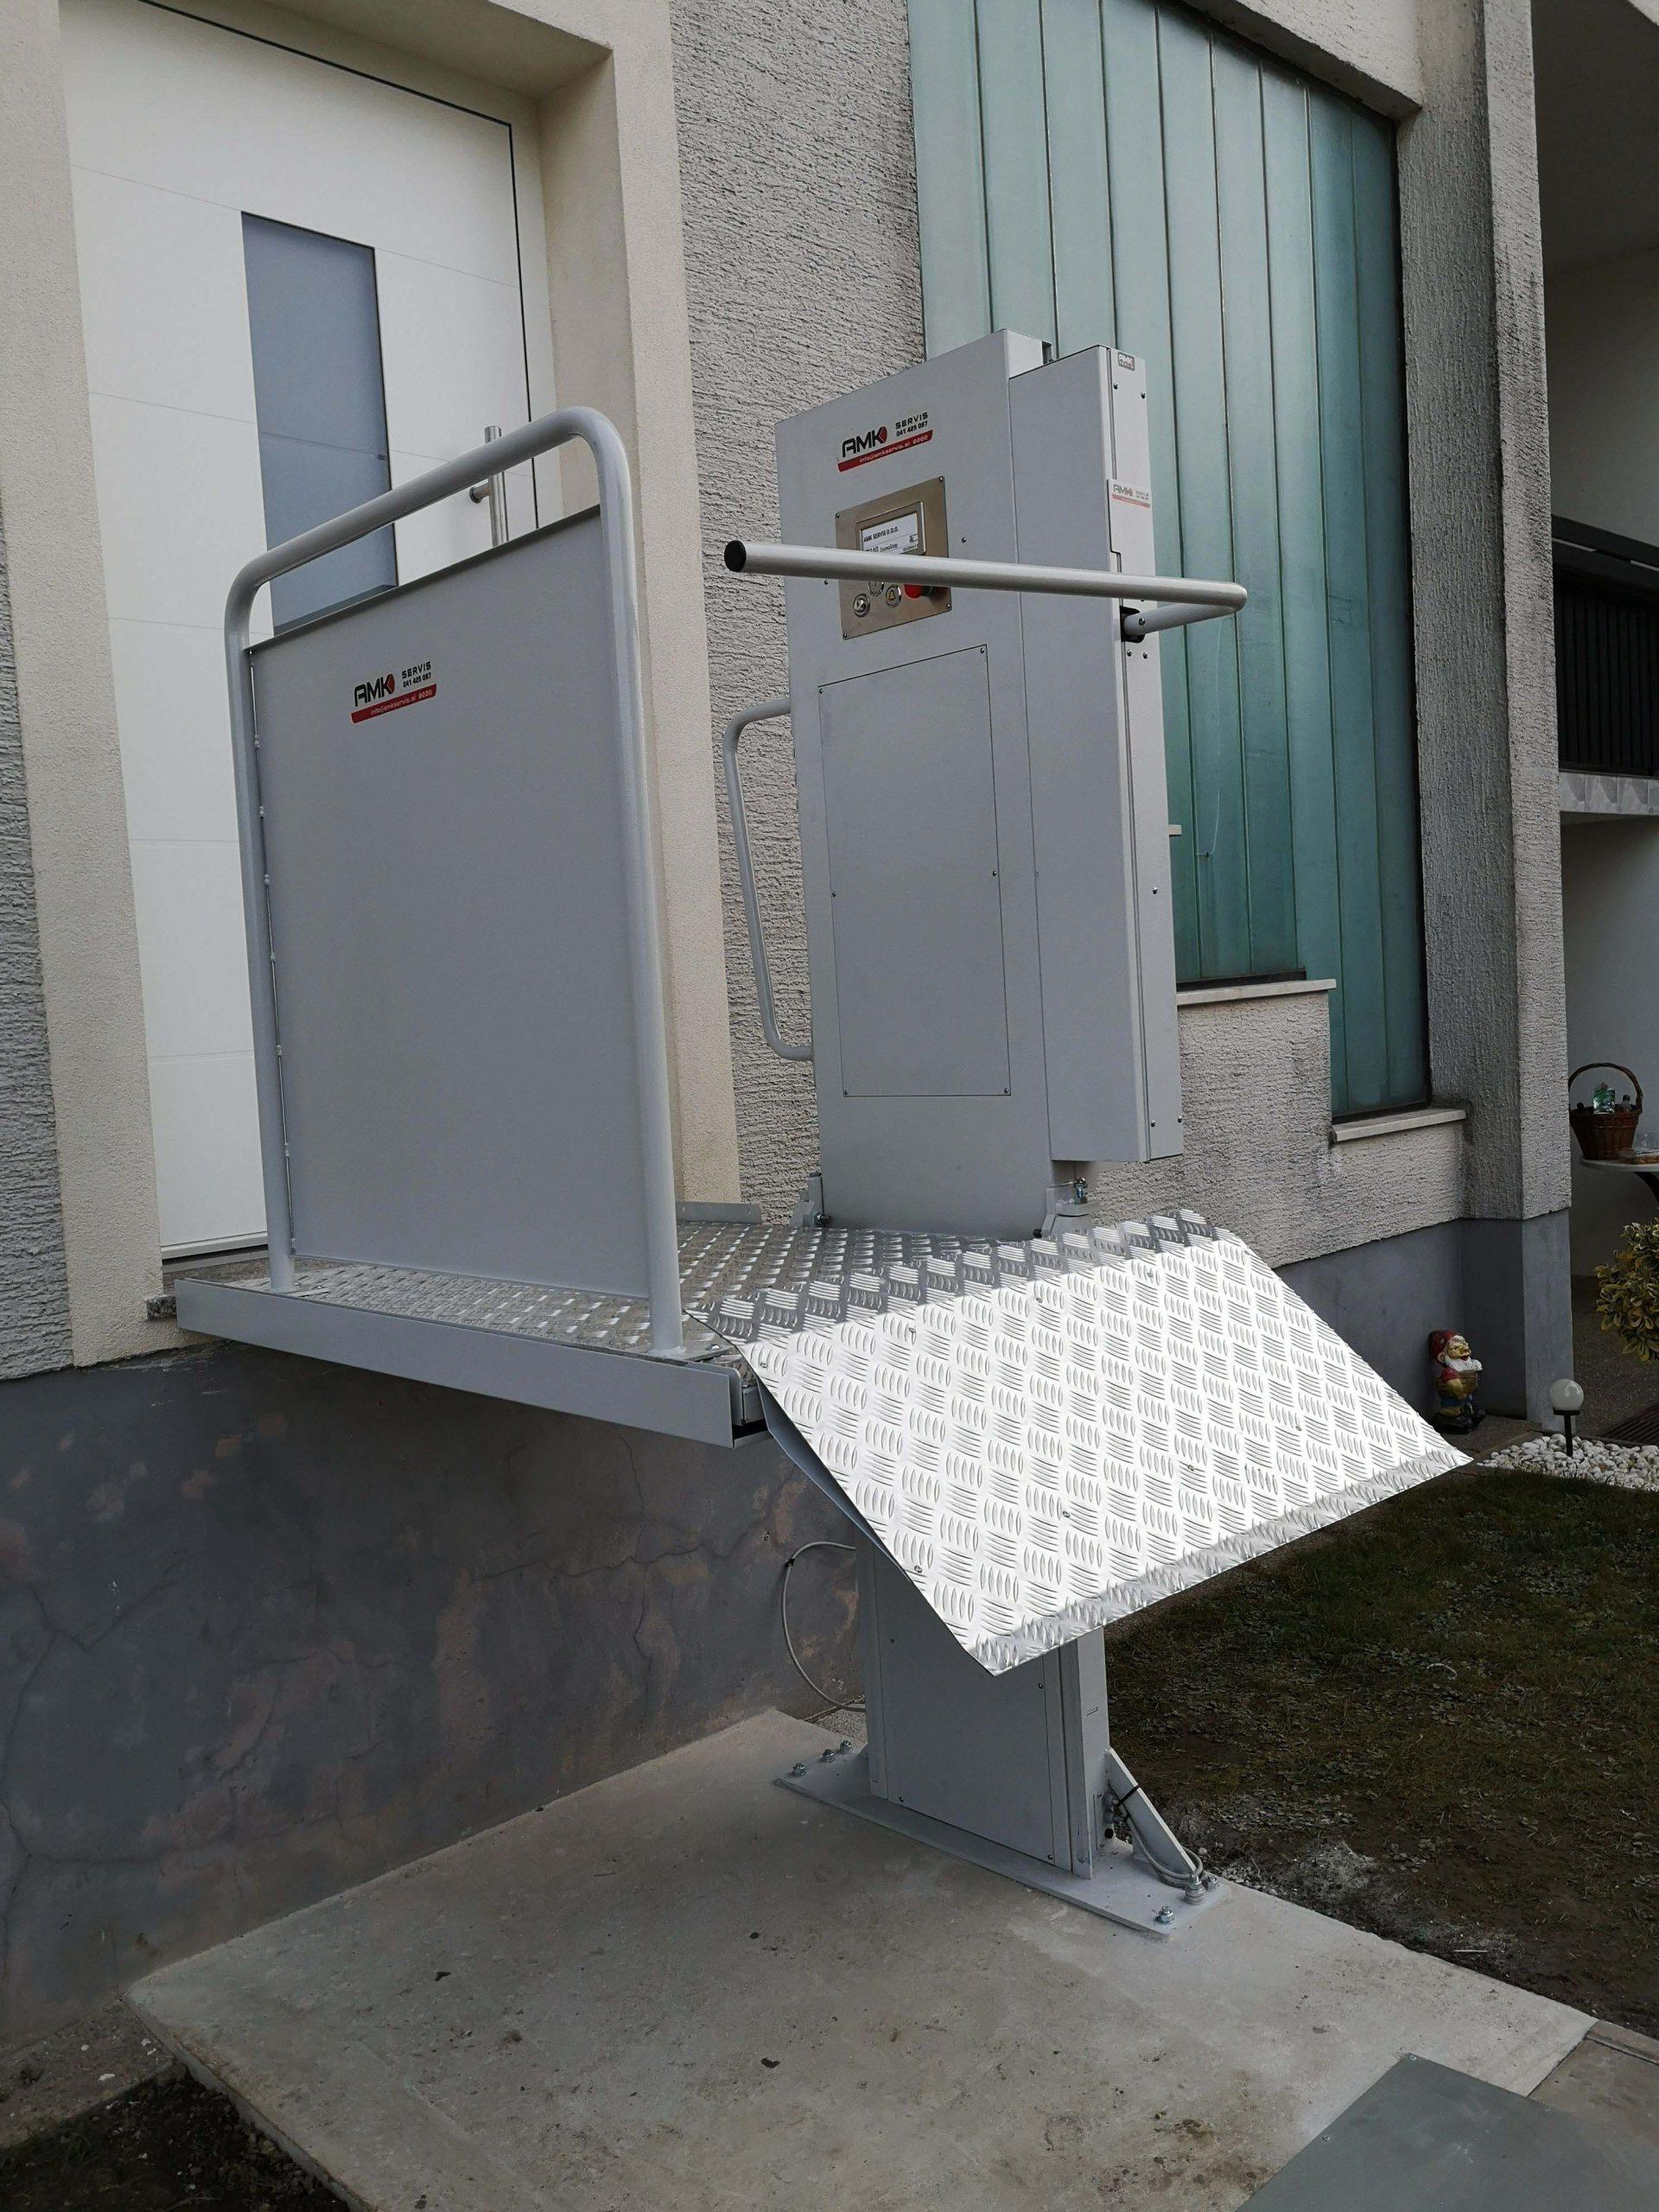 AMK dvigalo za invalida